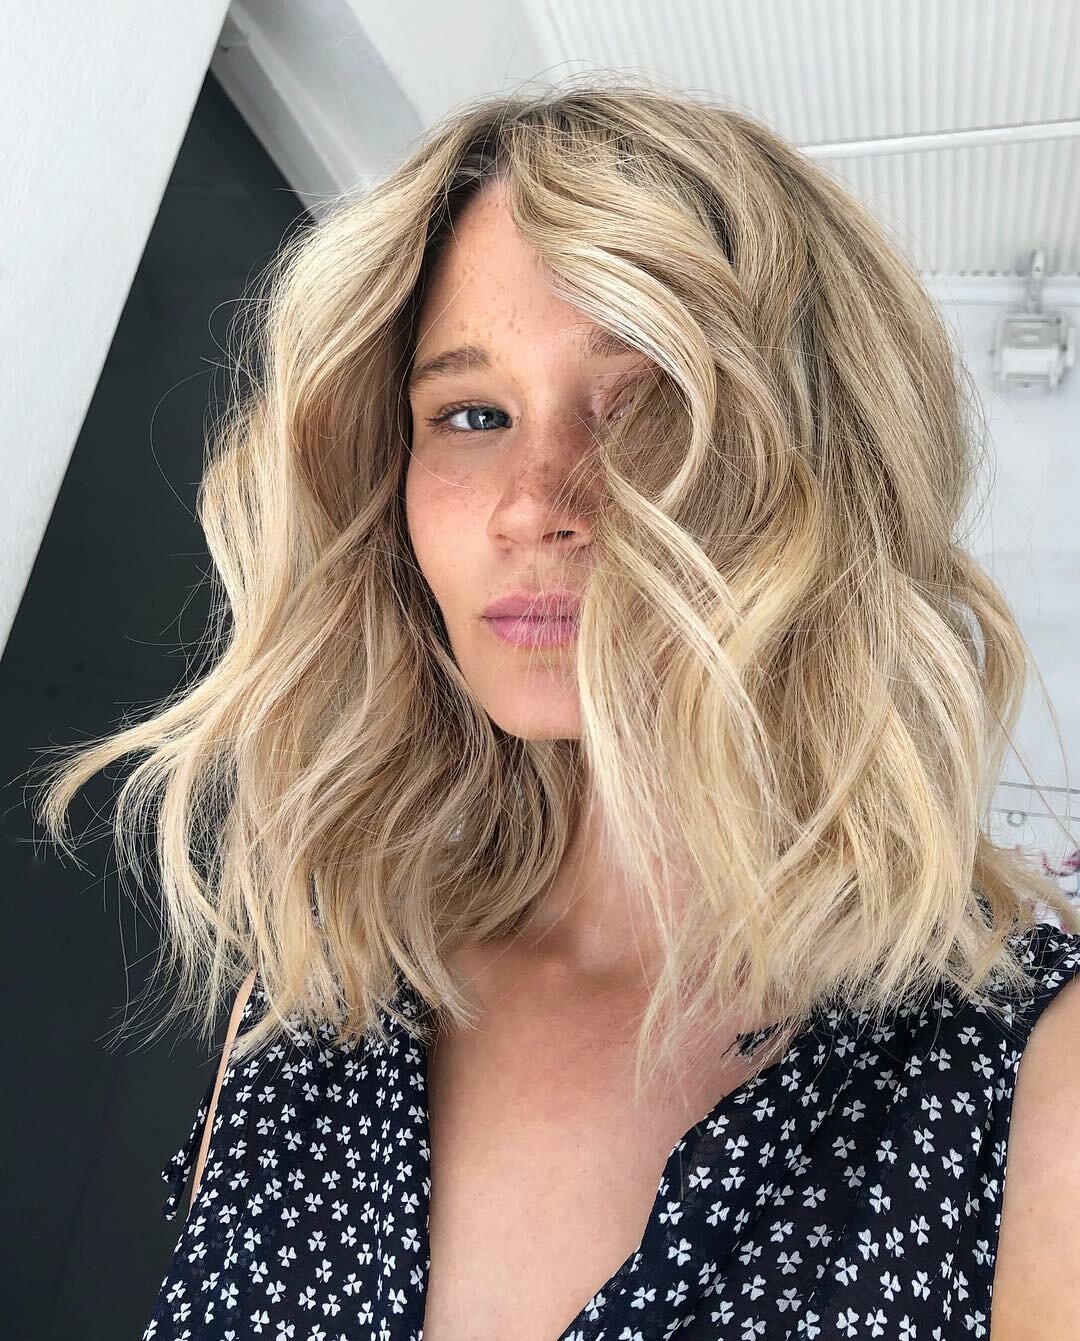 Cortes de cabello para cara redonda imagenes